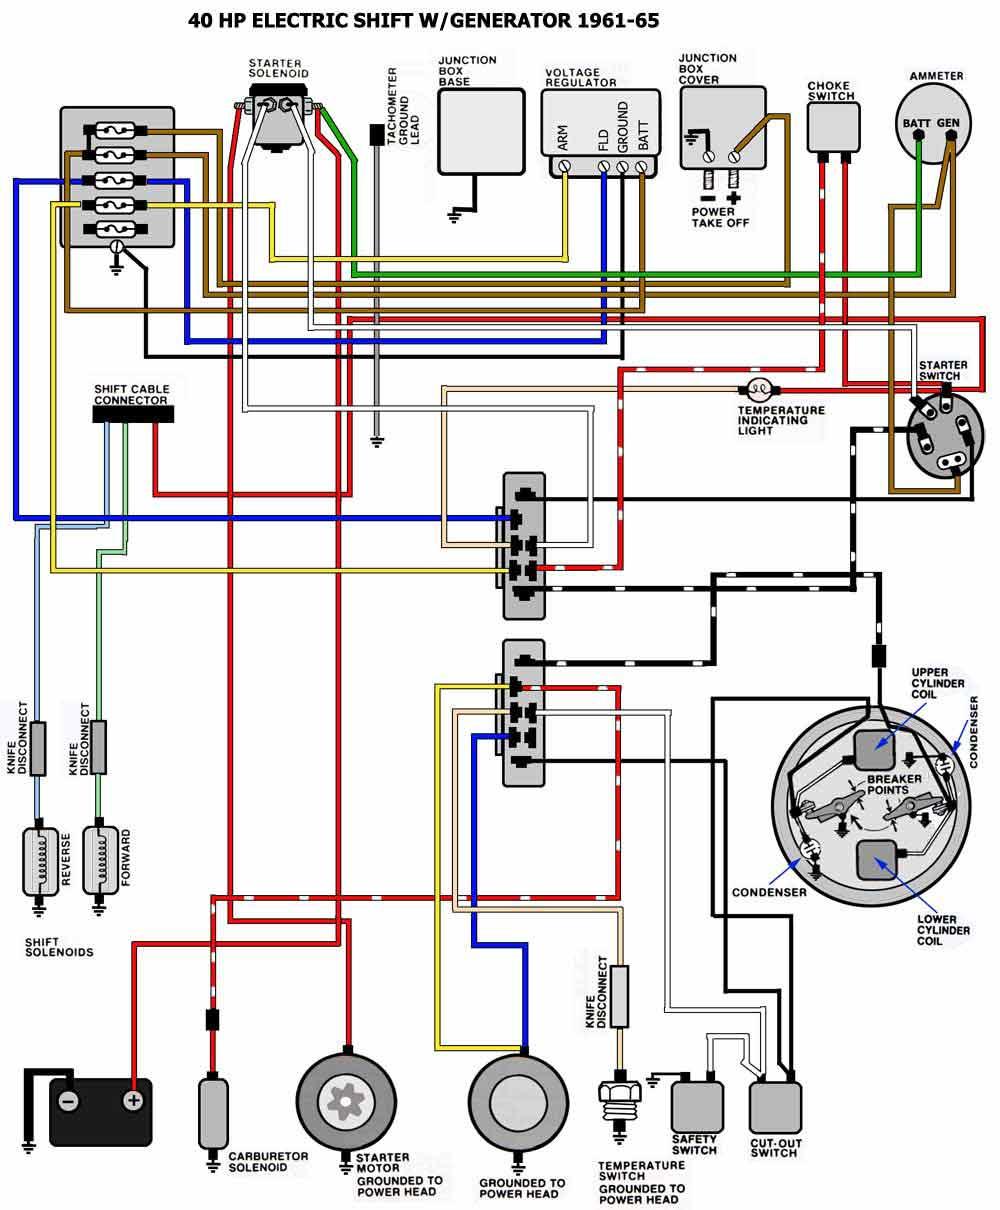 hight resolution of fiberglassics 59 johnson 50hp alternator fiberglassics forums motorcraft alternator wiring diagram evenrude wiring diagram alternator